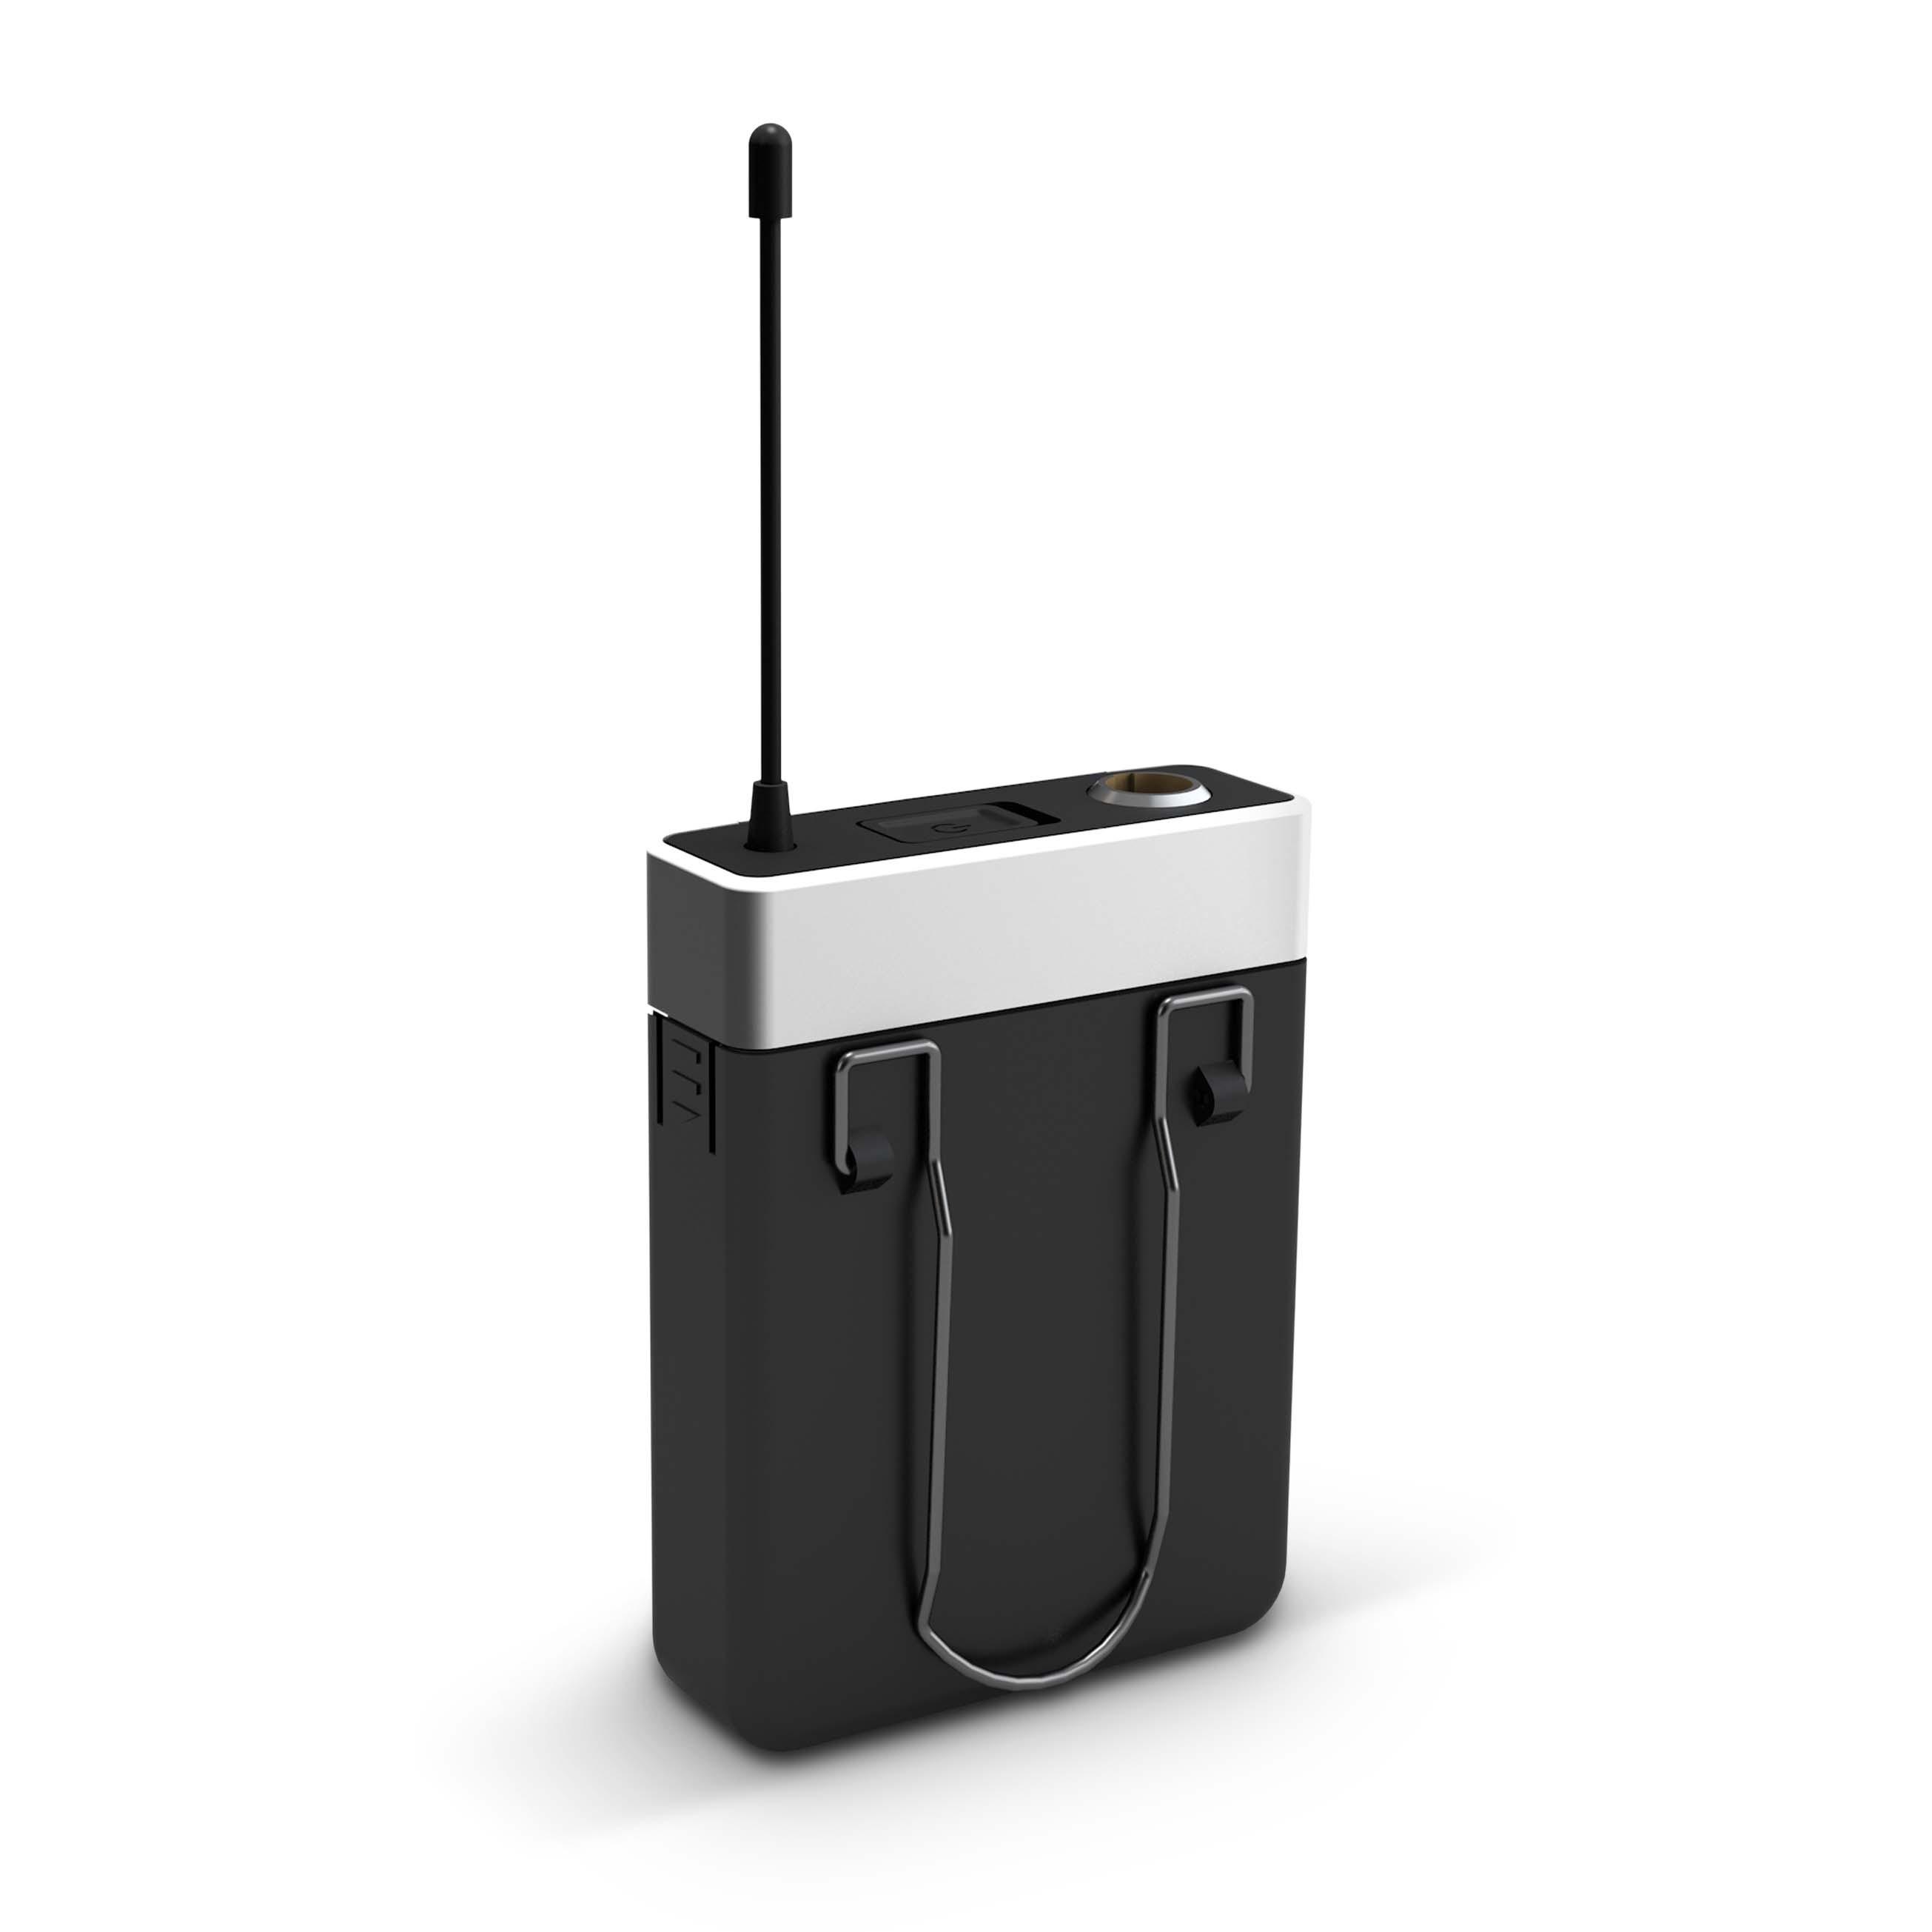 U506 BPH 2 Funkmikrofon System mit 2 x Bodypack und 2 x Headset